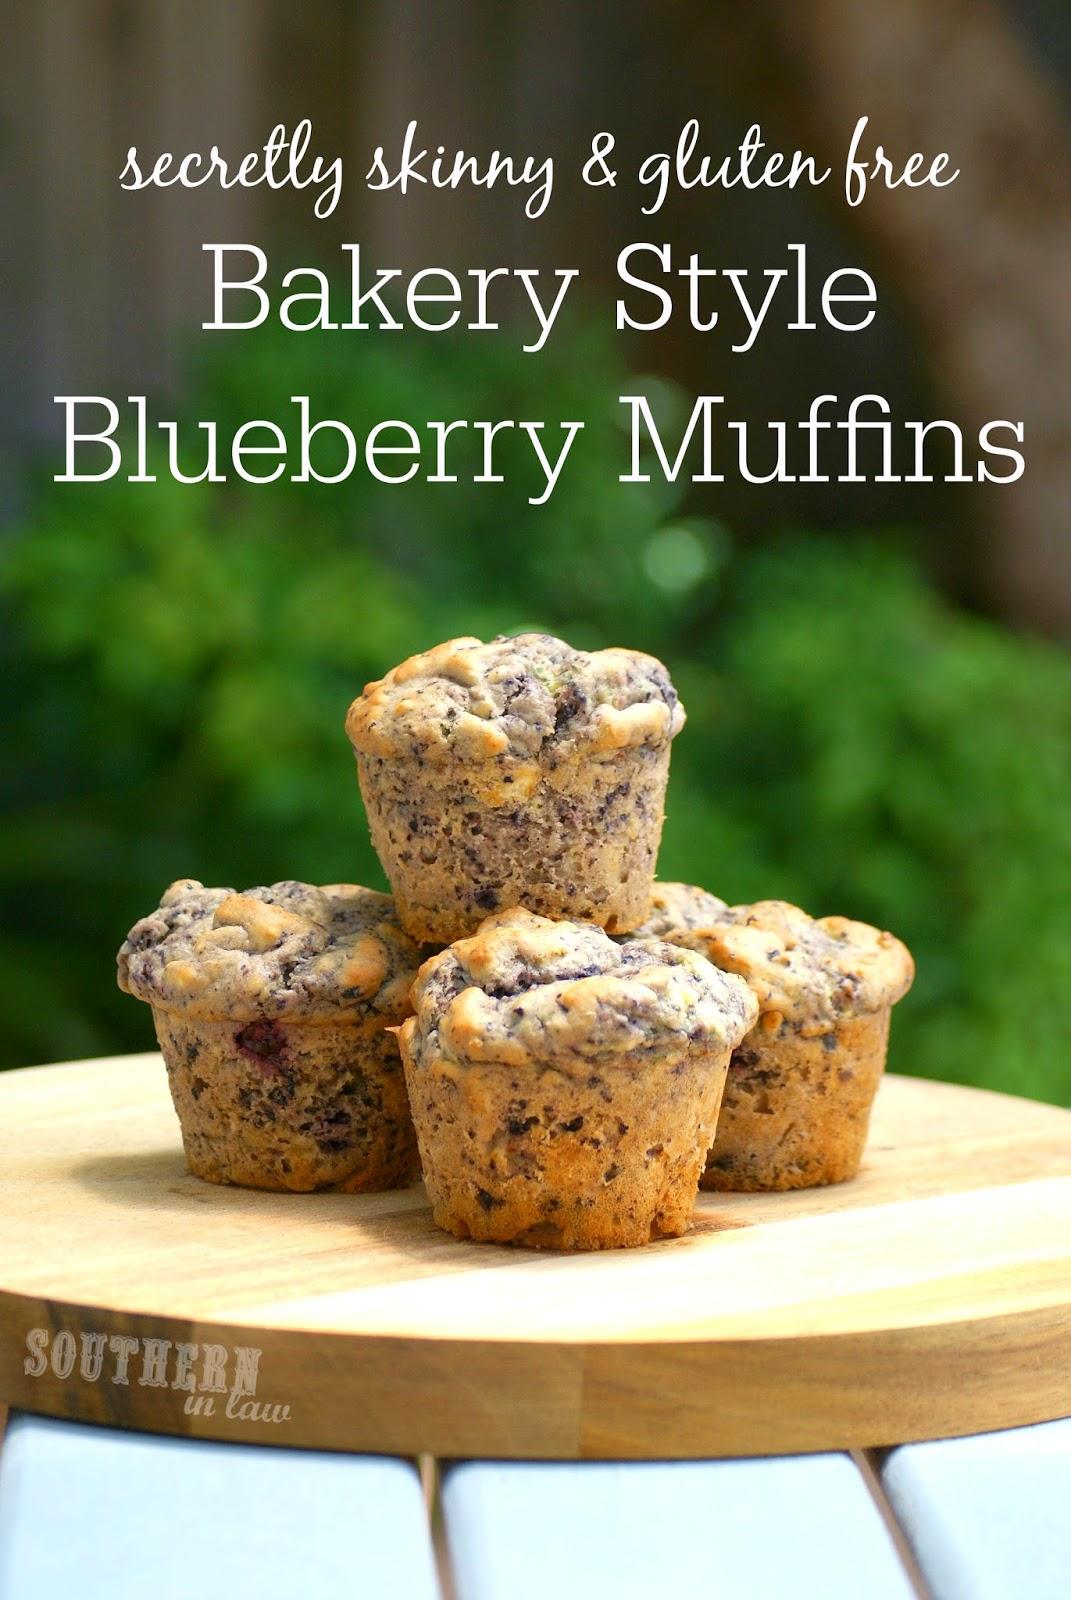 Healthy Bakery Style Blueberry Muffin Recipe - low fat, gluten free, healthy, skinny recipe, freezer friendly, healthy lunchbox snacks,